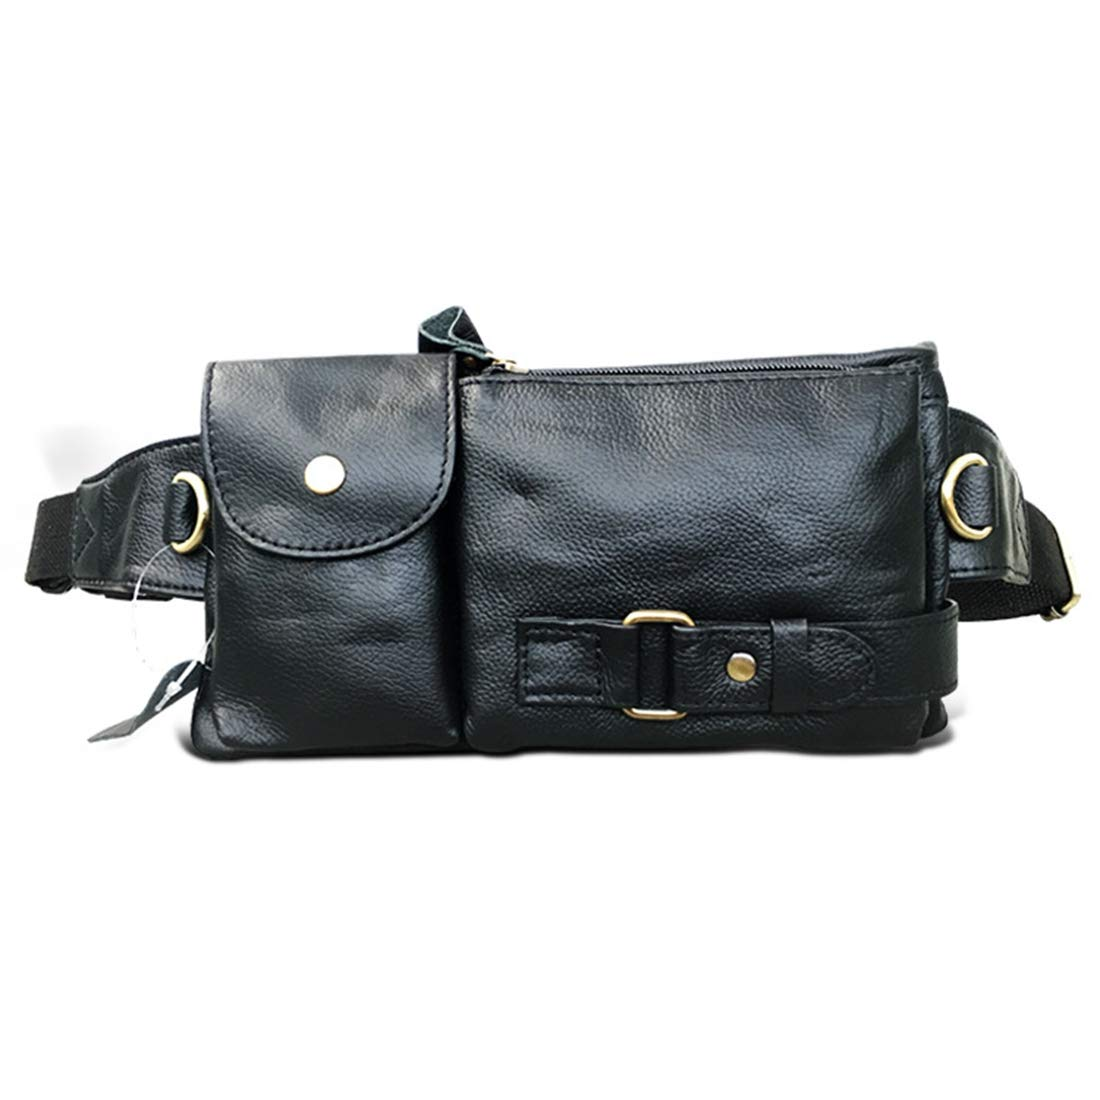 Color : Black RABILTY Belt Holster Bag Fanny Waist Pack Crossbody Bag for Men Boy Black Cowhide Travel Money Belt RFID Blocking